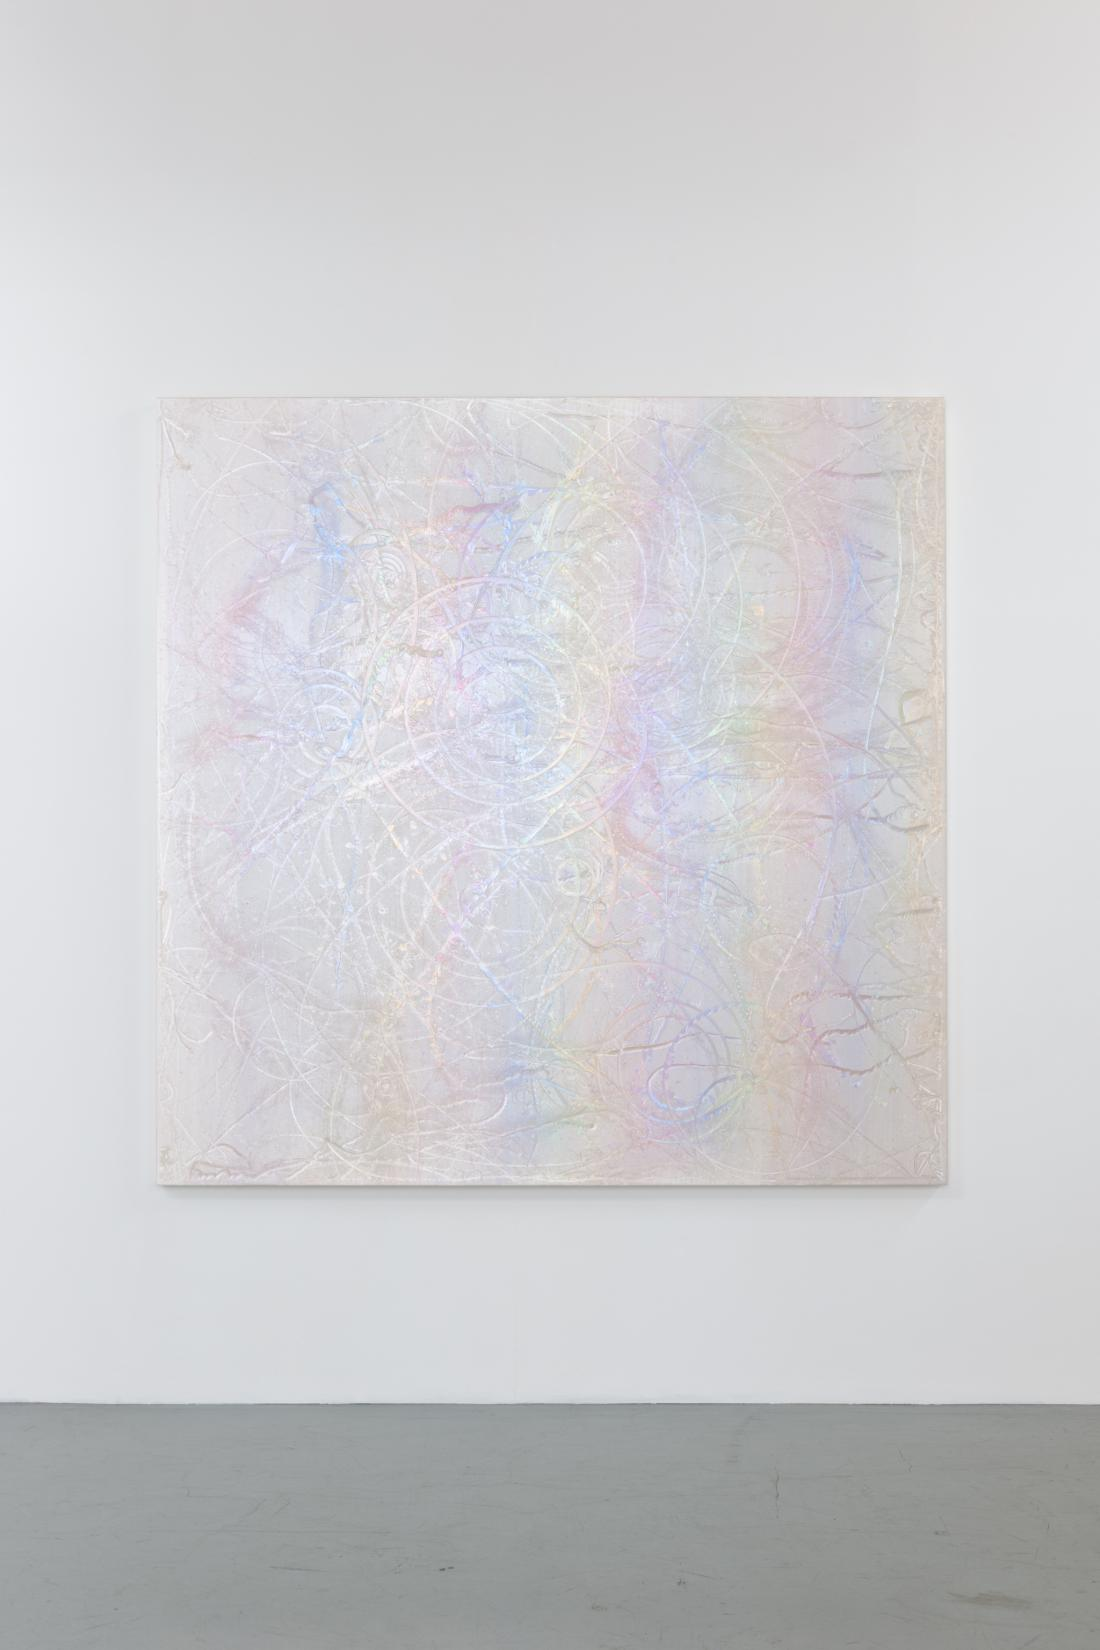 """THE BATTLE STAGE"", 2012, 180 x 180 cm, acrylic on cotton, photo : Nobutada OMOTE|SANDWICH"